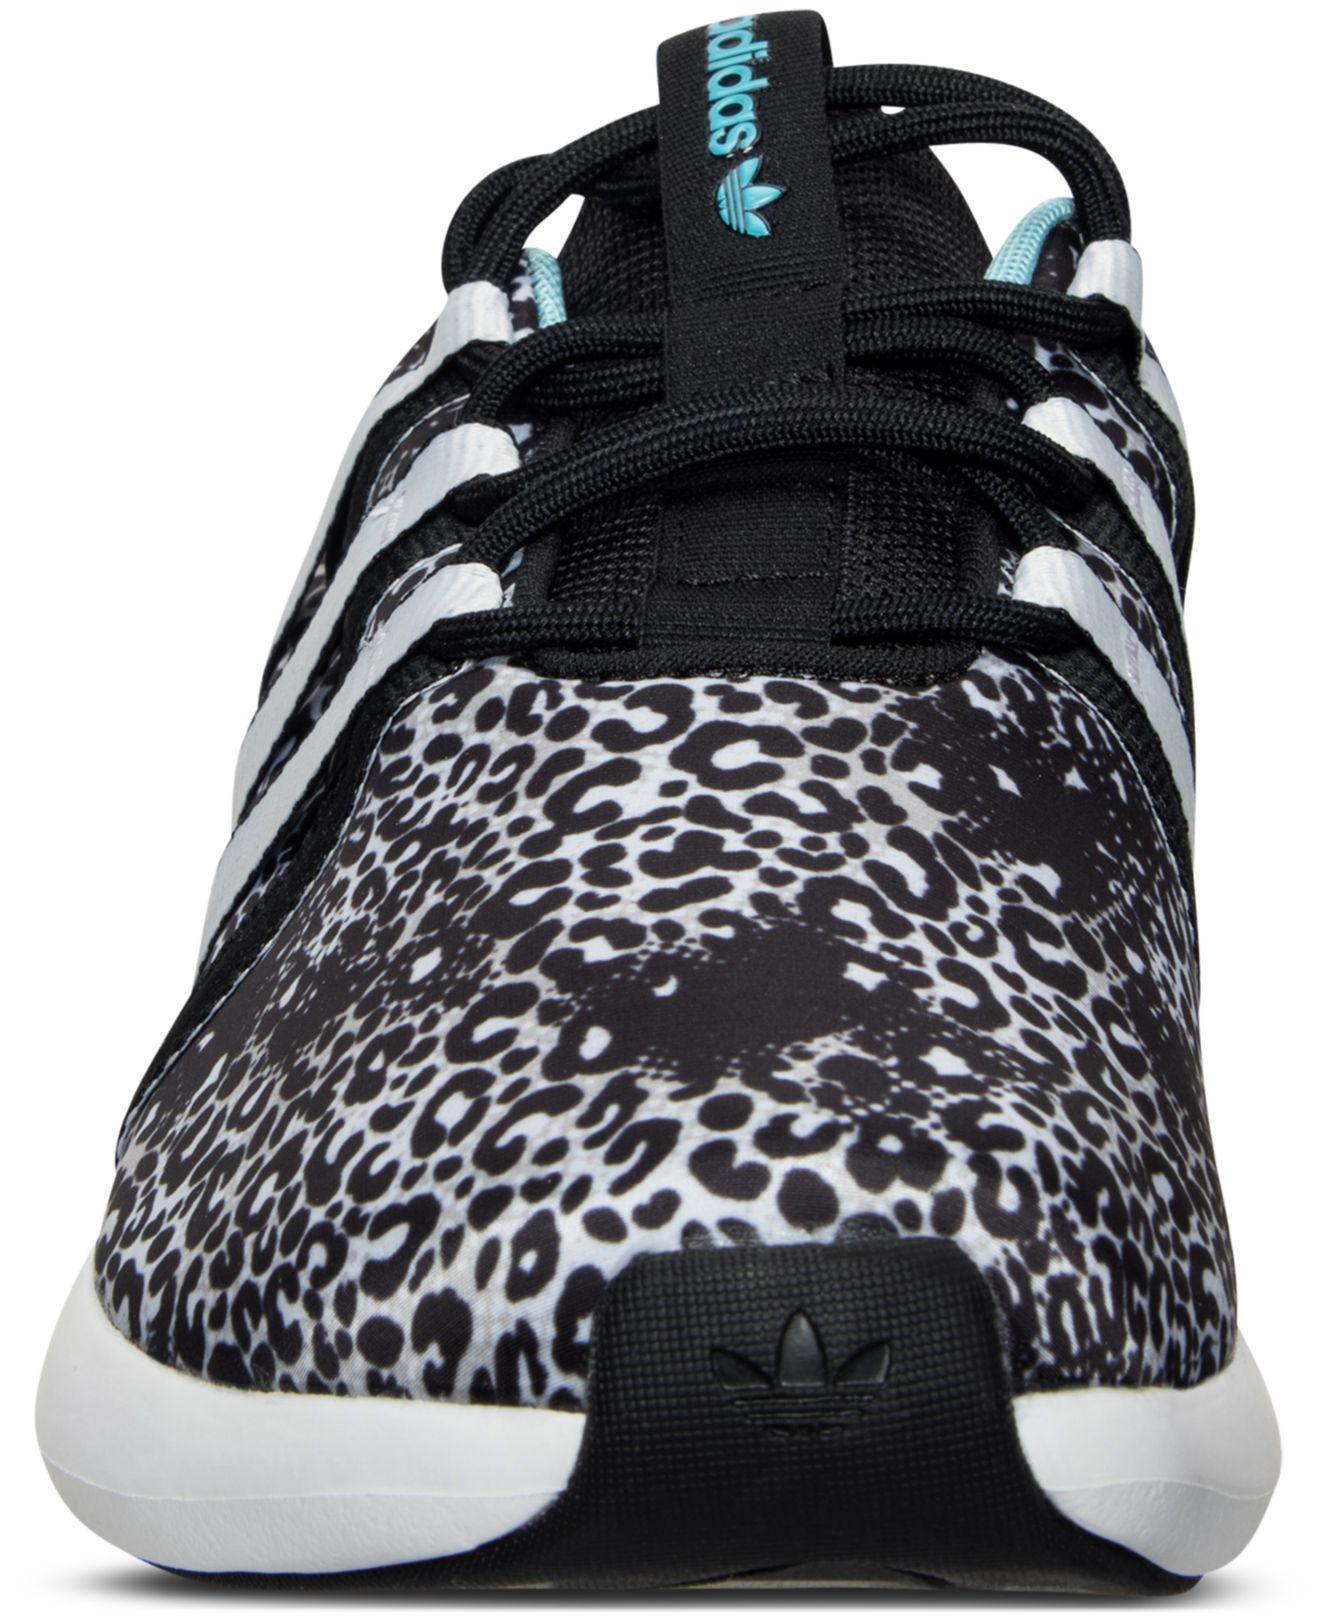 Lyst - adidas Originals Women s Originals Sl Loop Racer Casual ... 69e1c06f3c